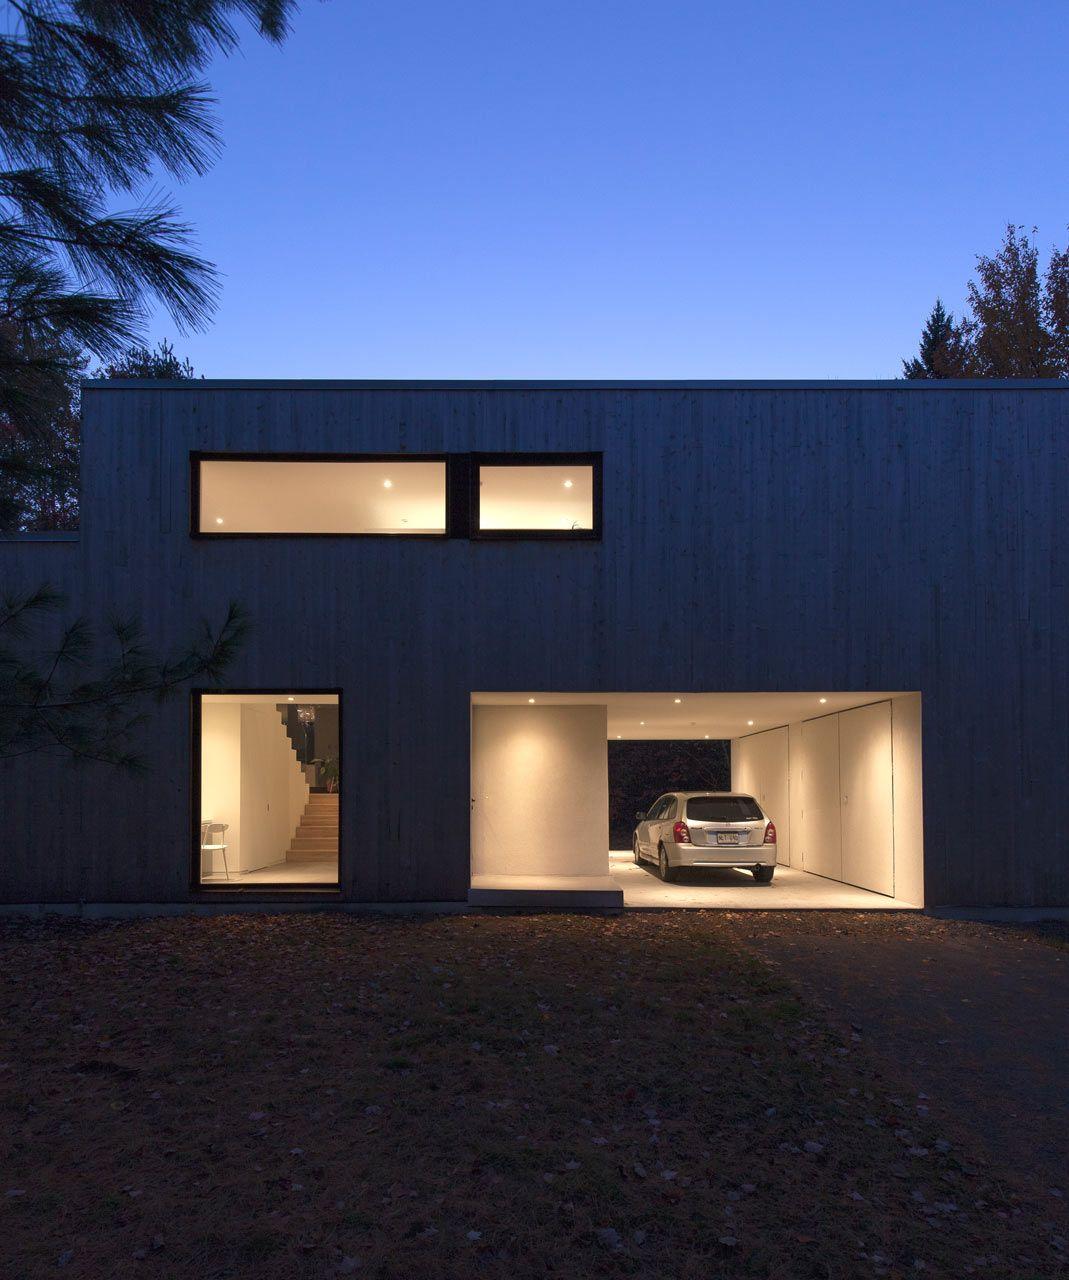 interior design of bungalow houses%0A A   s  Split Level Bungalow Goes Modern  Maison Terrebonne designed by La  SHED architecture